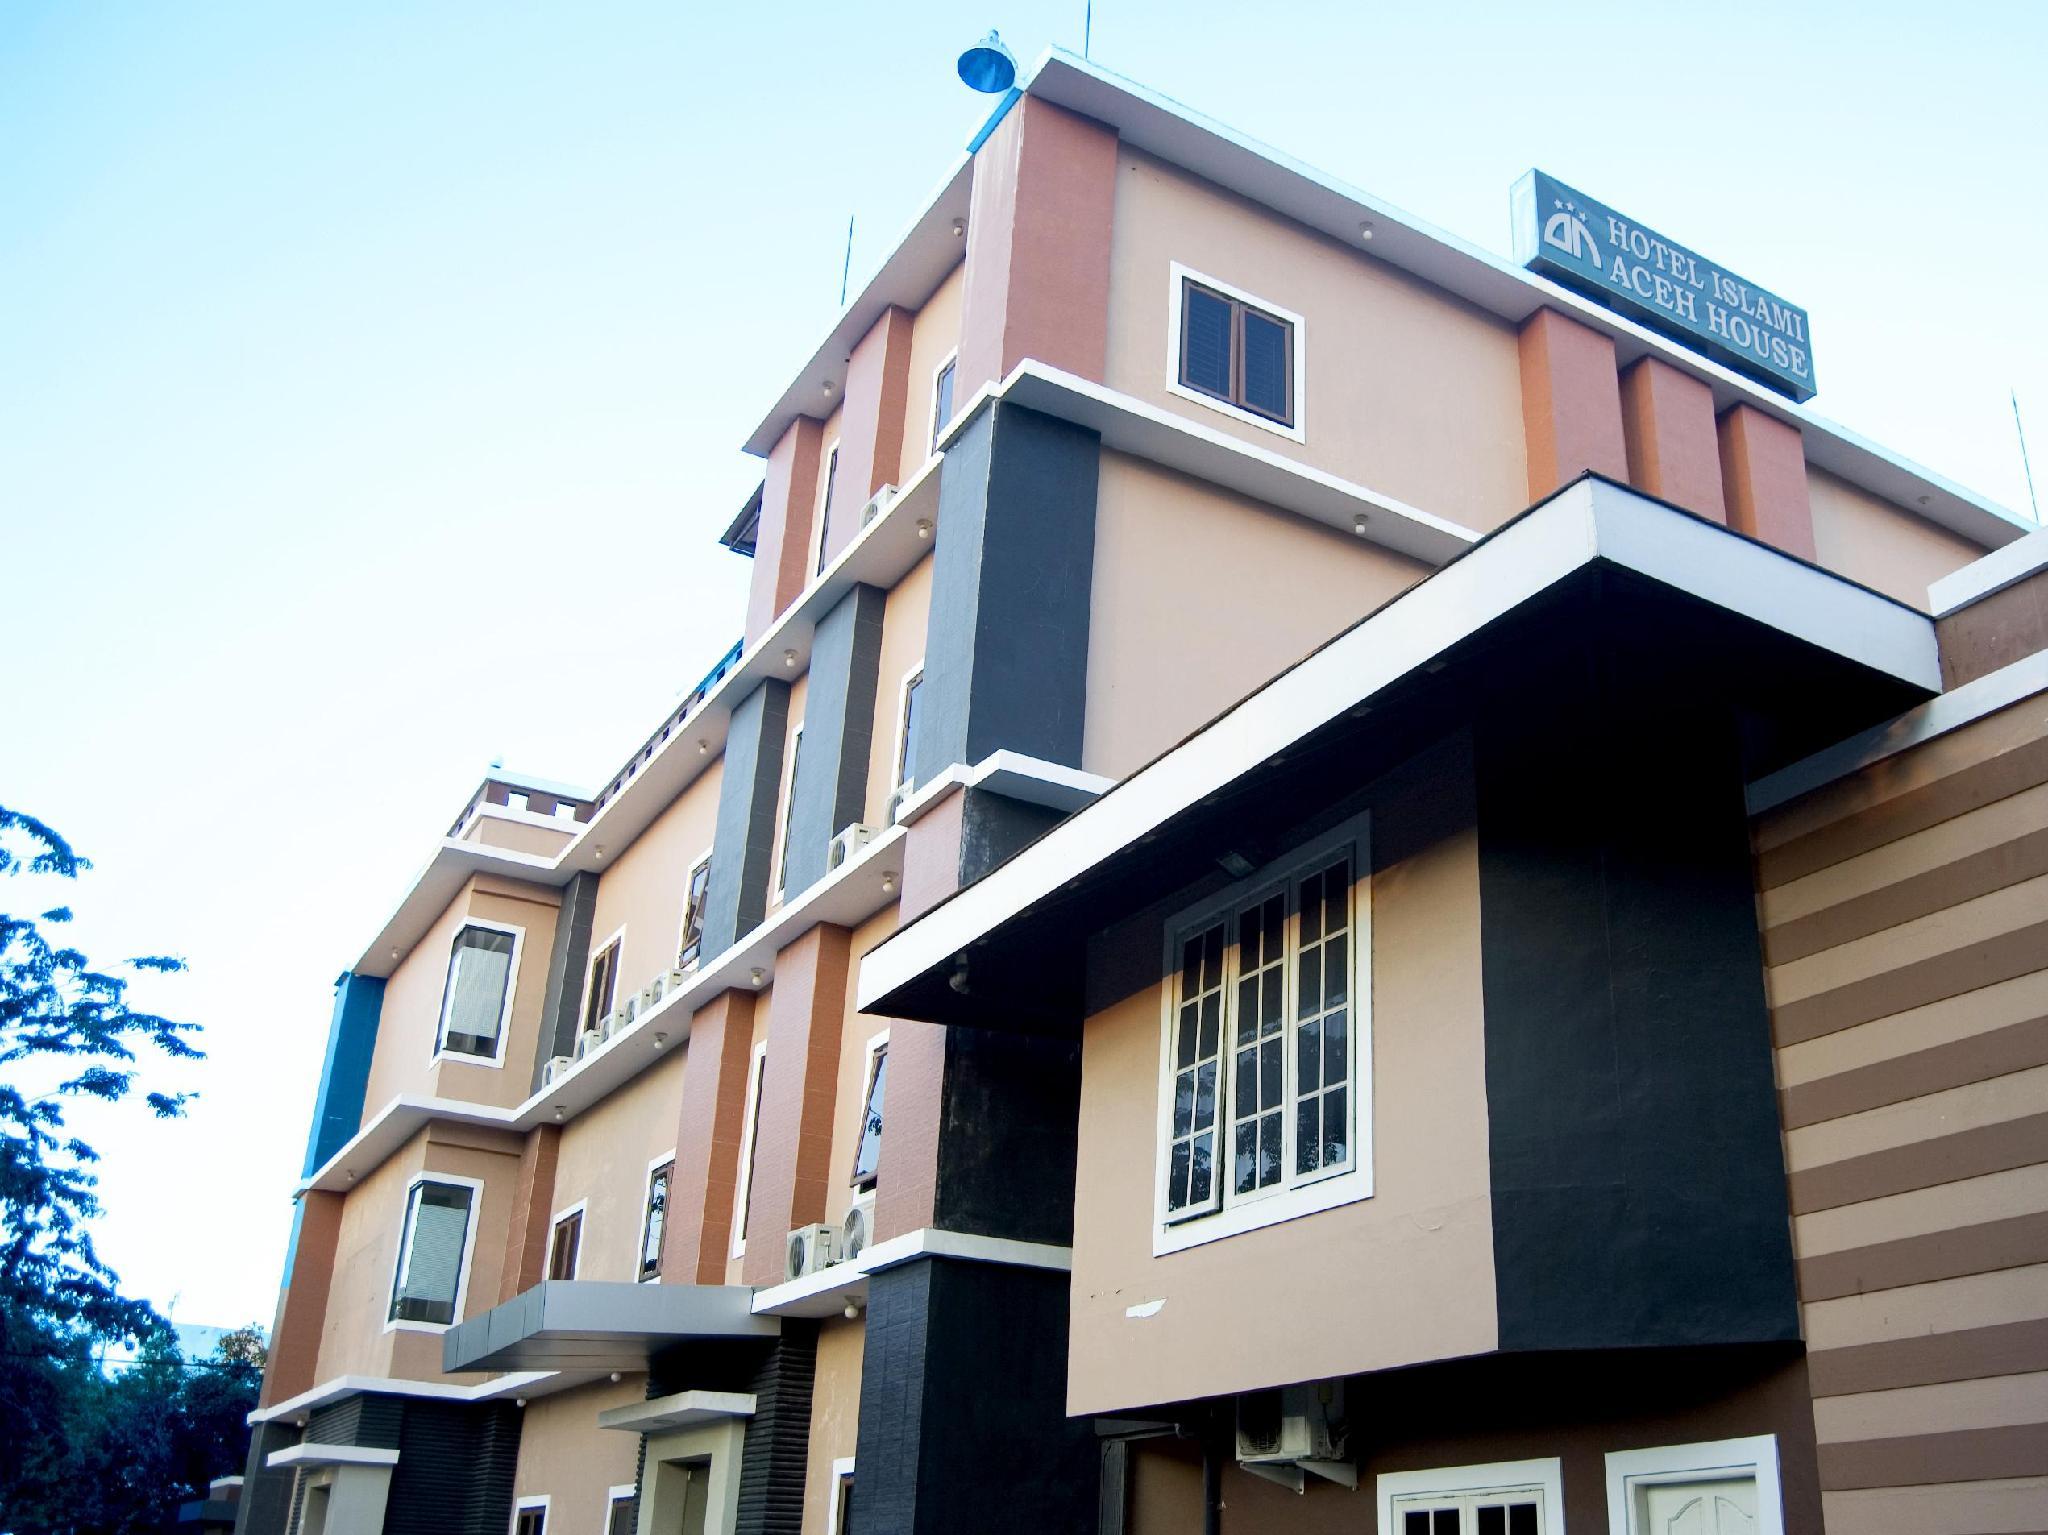 Hotel Syariah Aceh House Gajah Mada, Medan